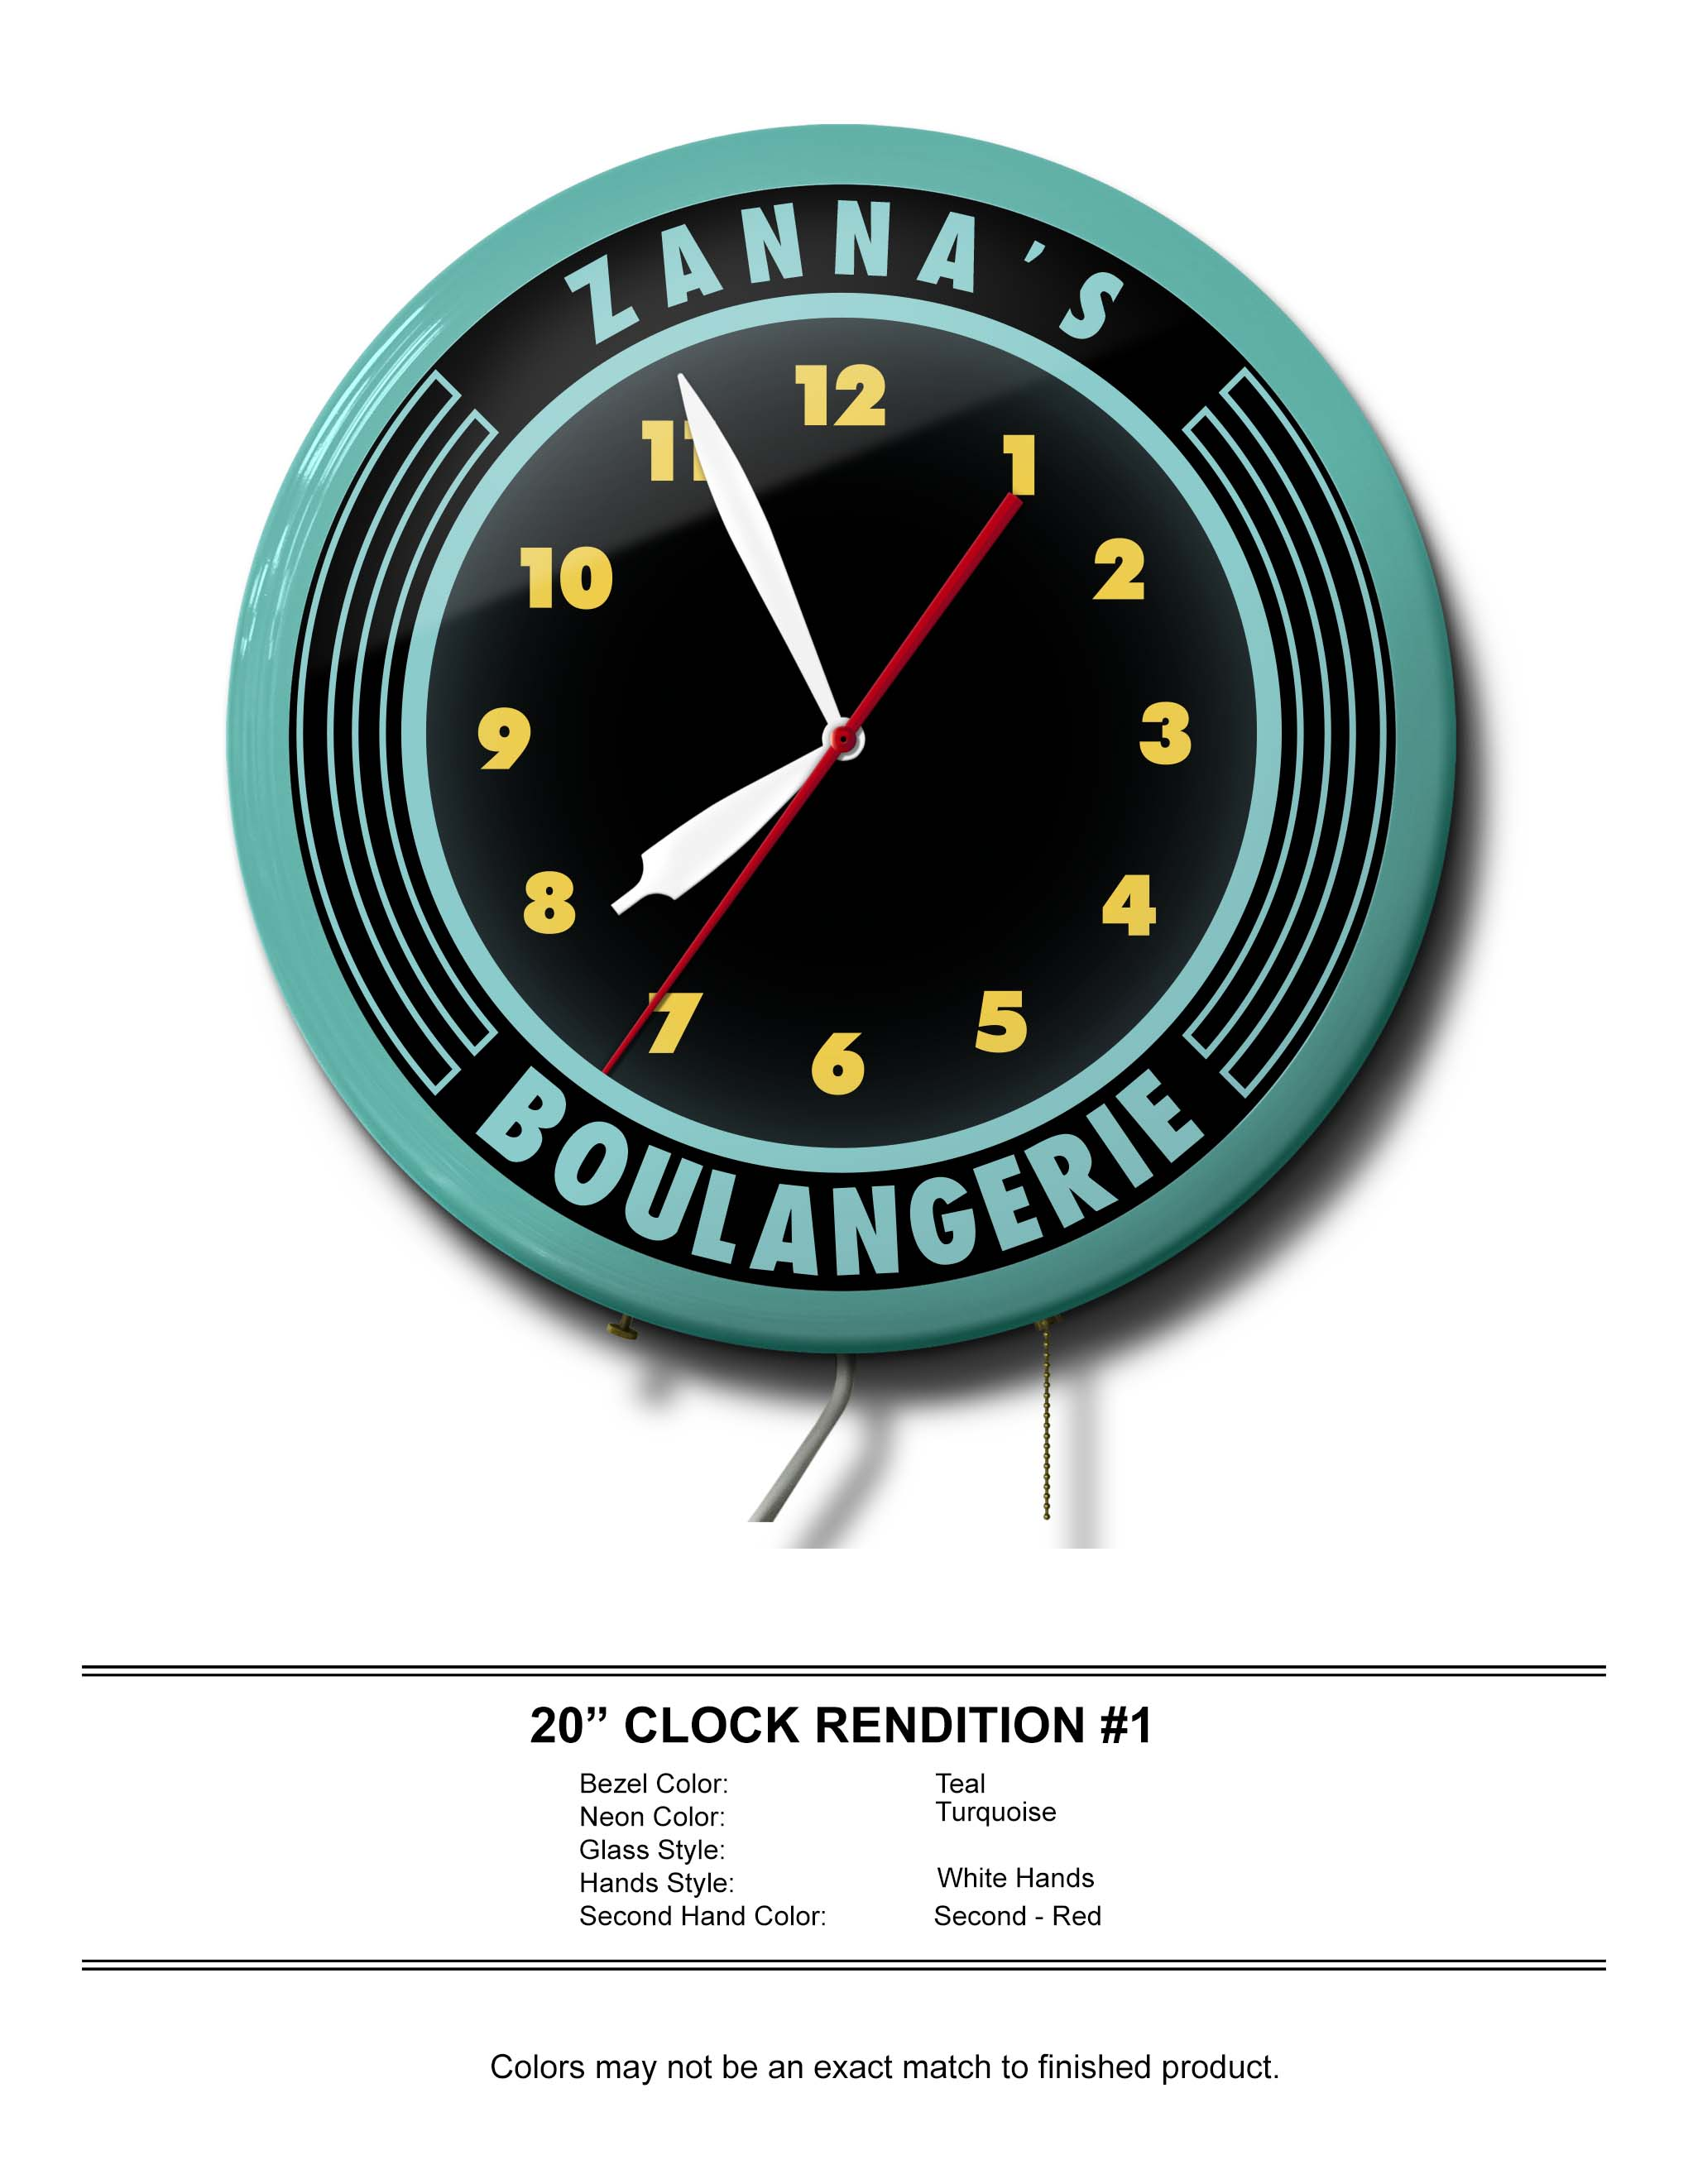 Custom Zanna's Boulangerie Neon Clock